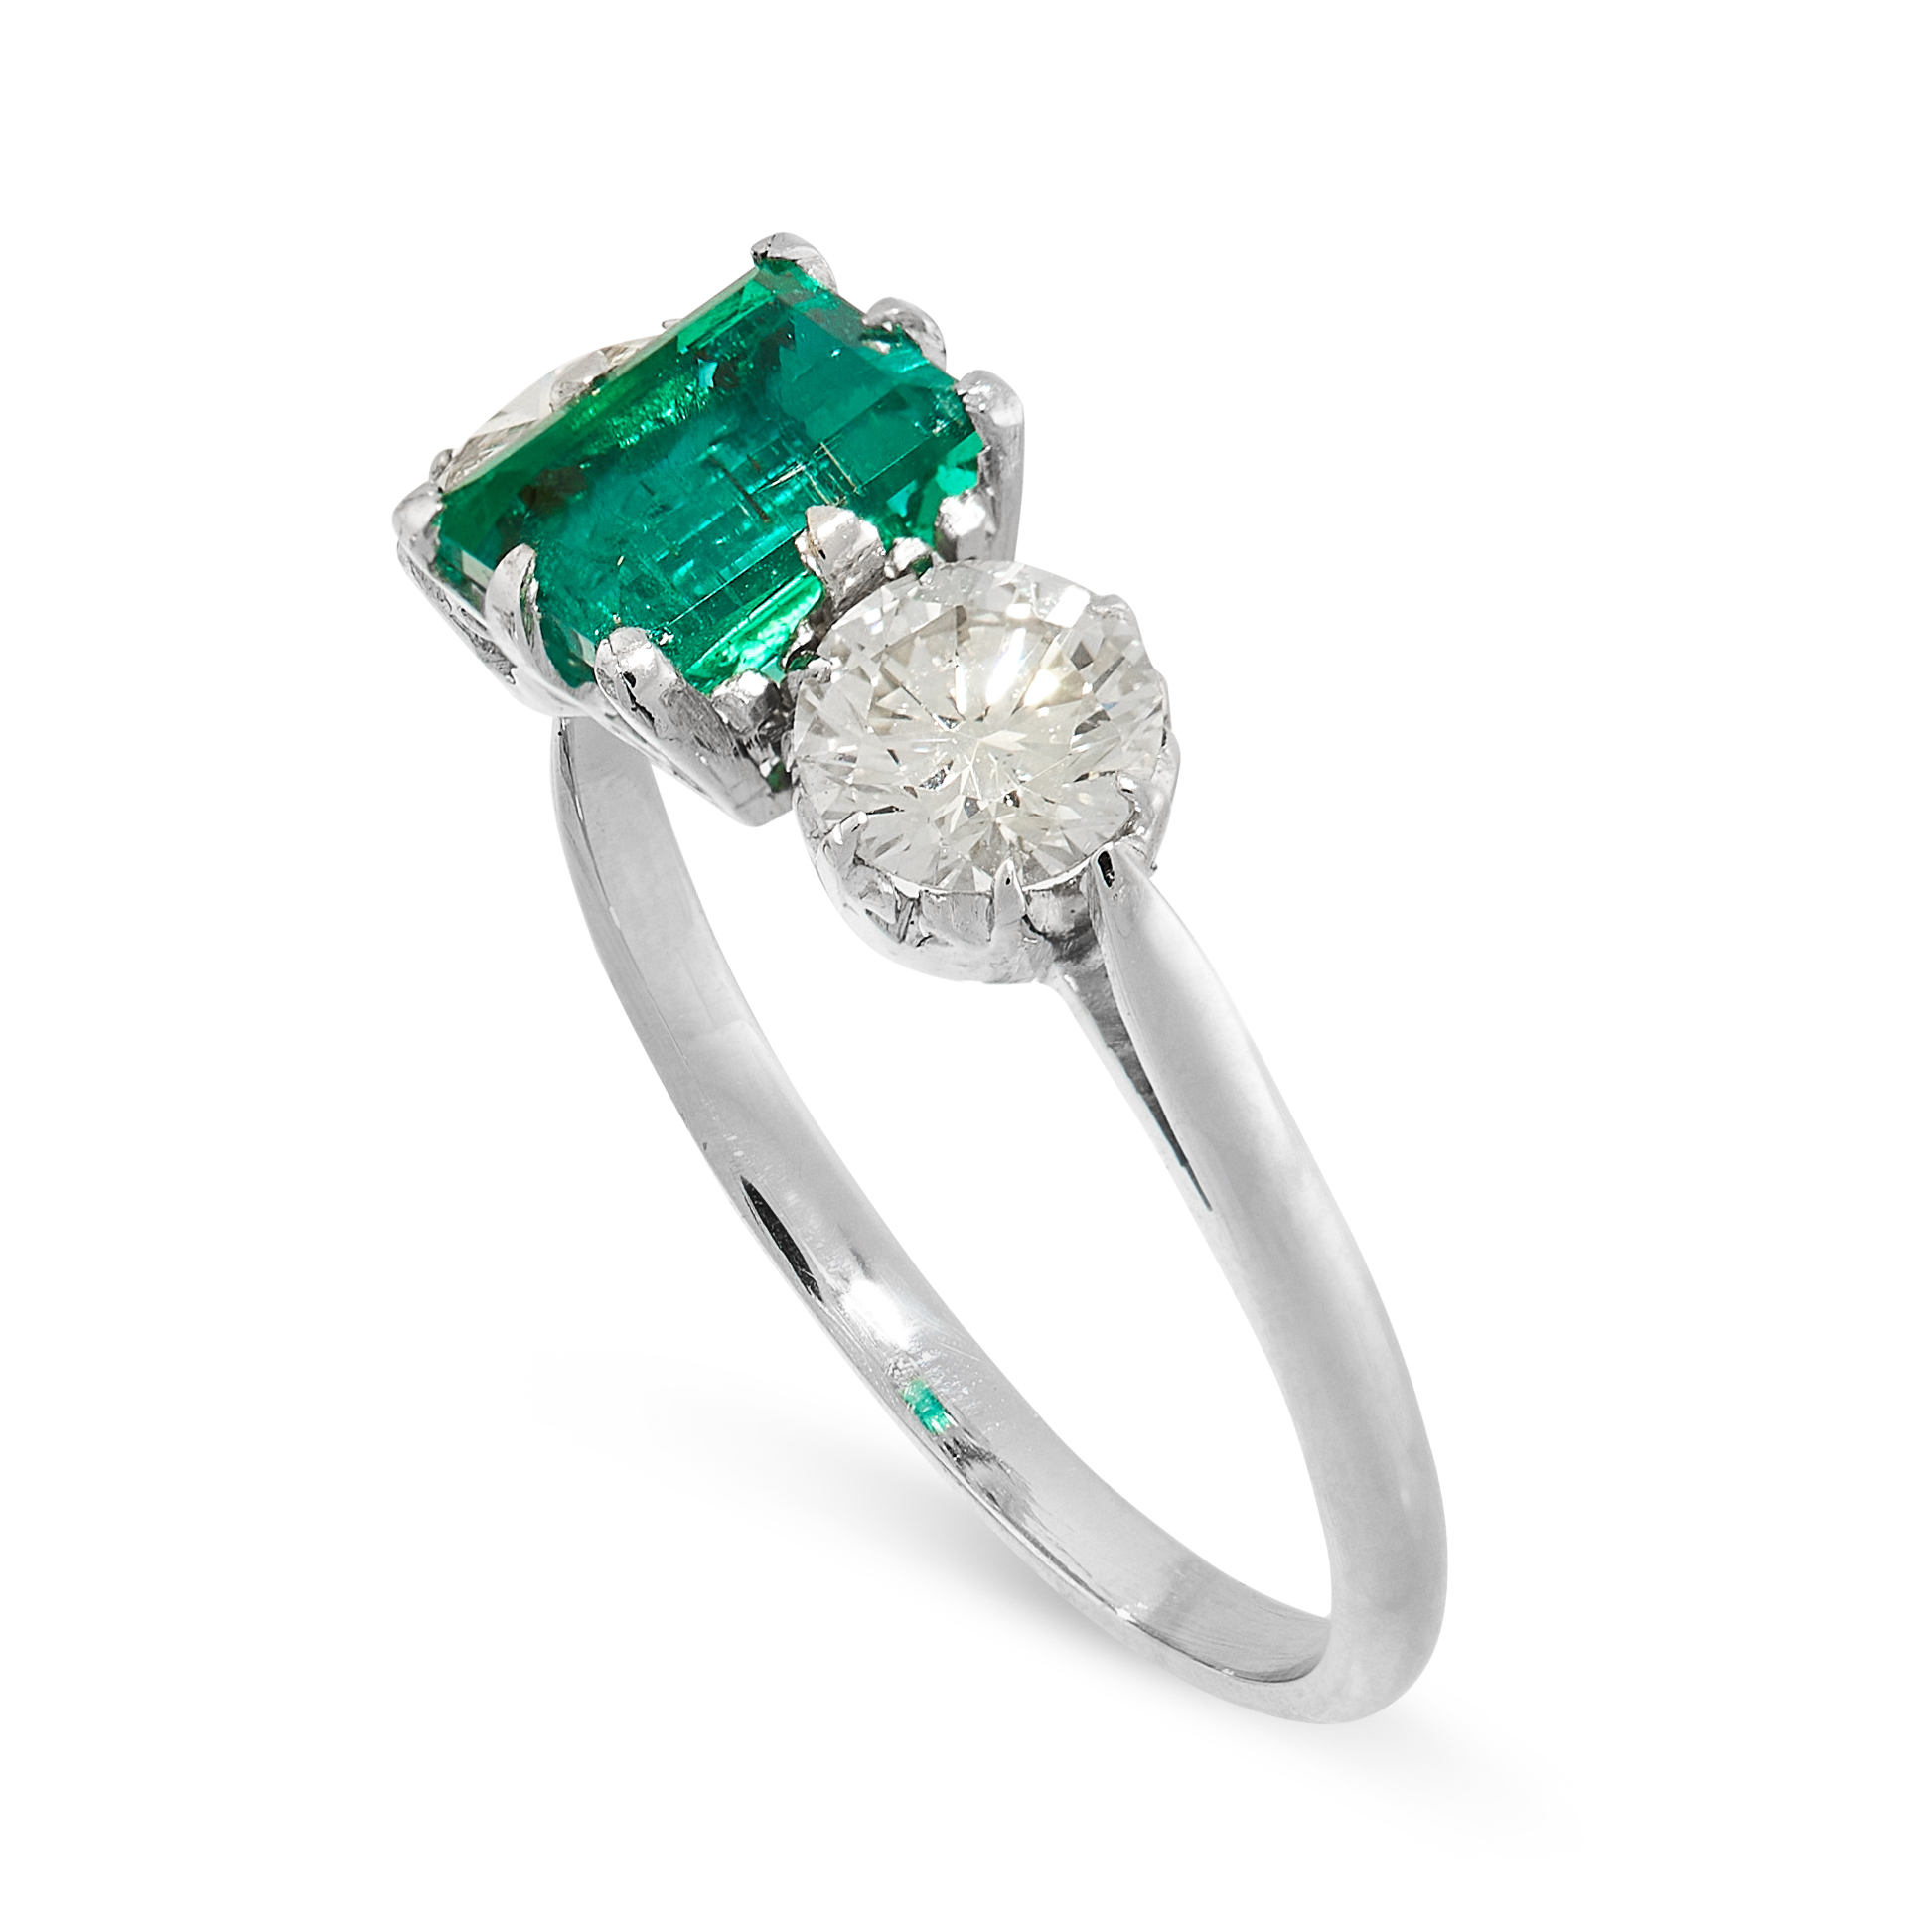 AN EMERALD AND DIAMOND DRESS RING set with a rectangular step cut emerald of 1.19 carats, between - Image 2 of 2